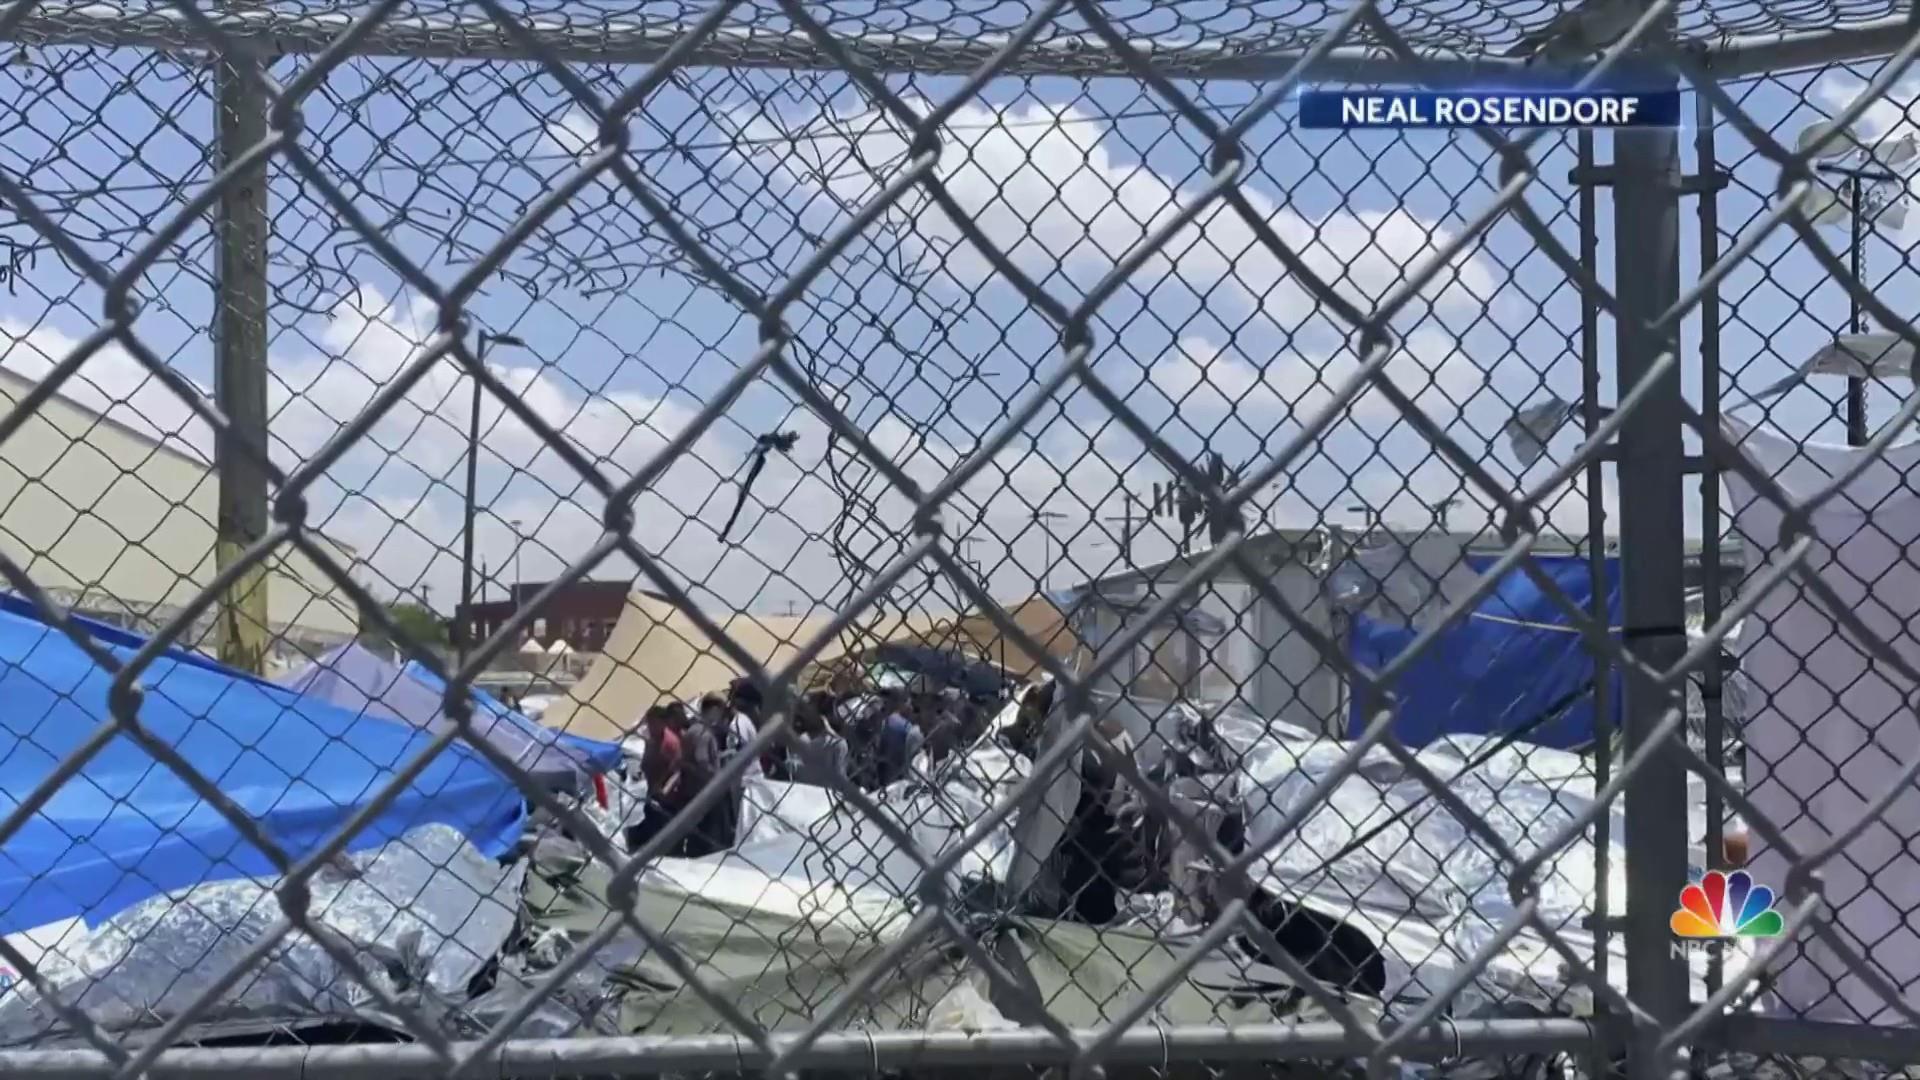 100 migrant children returned to troubled detention center